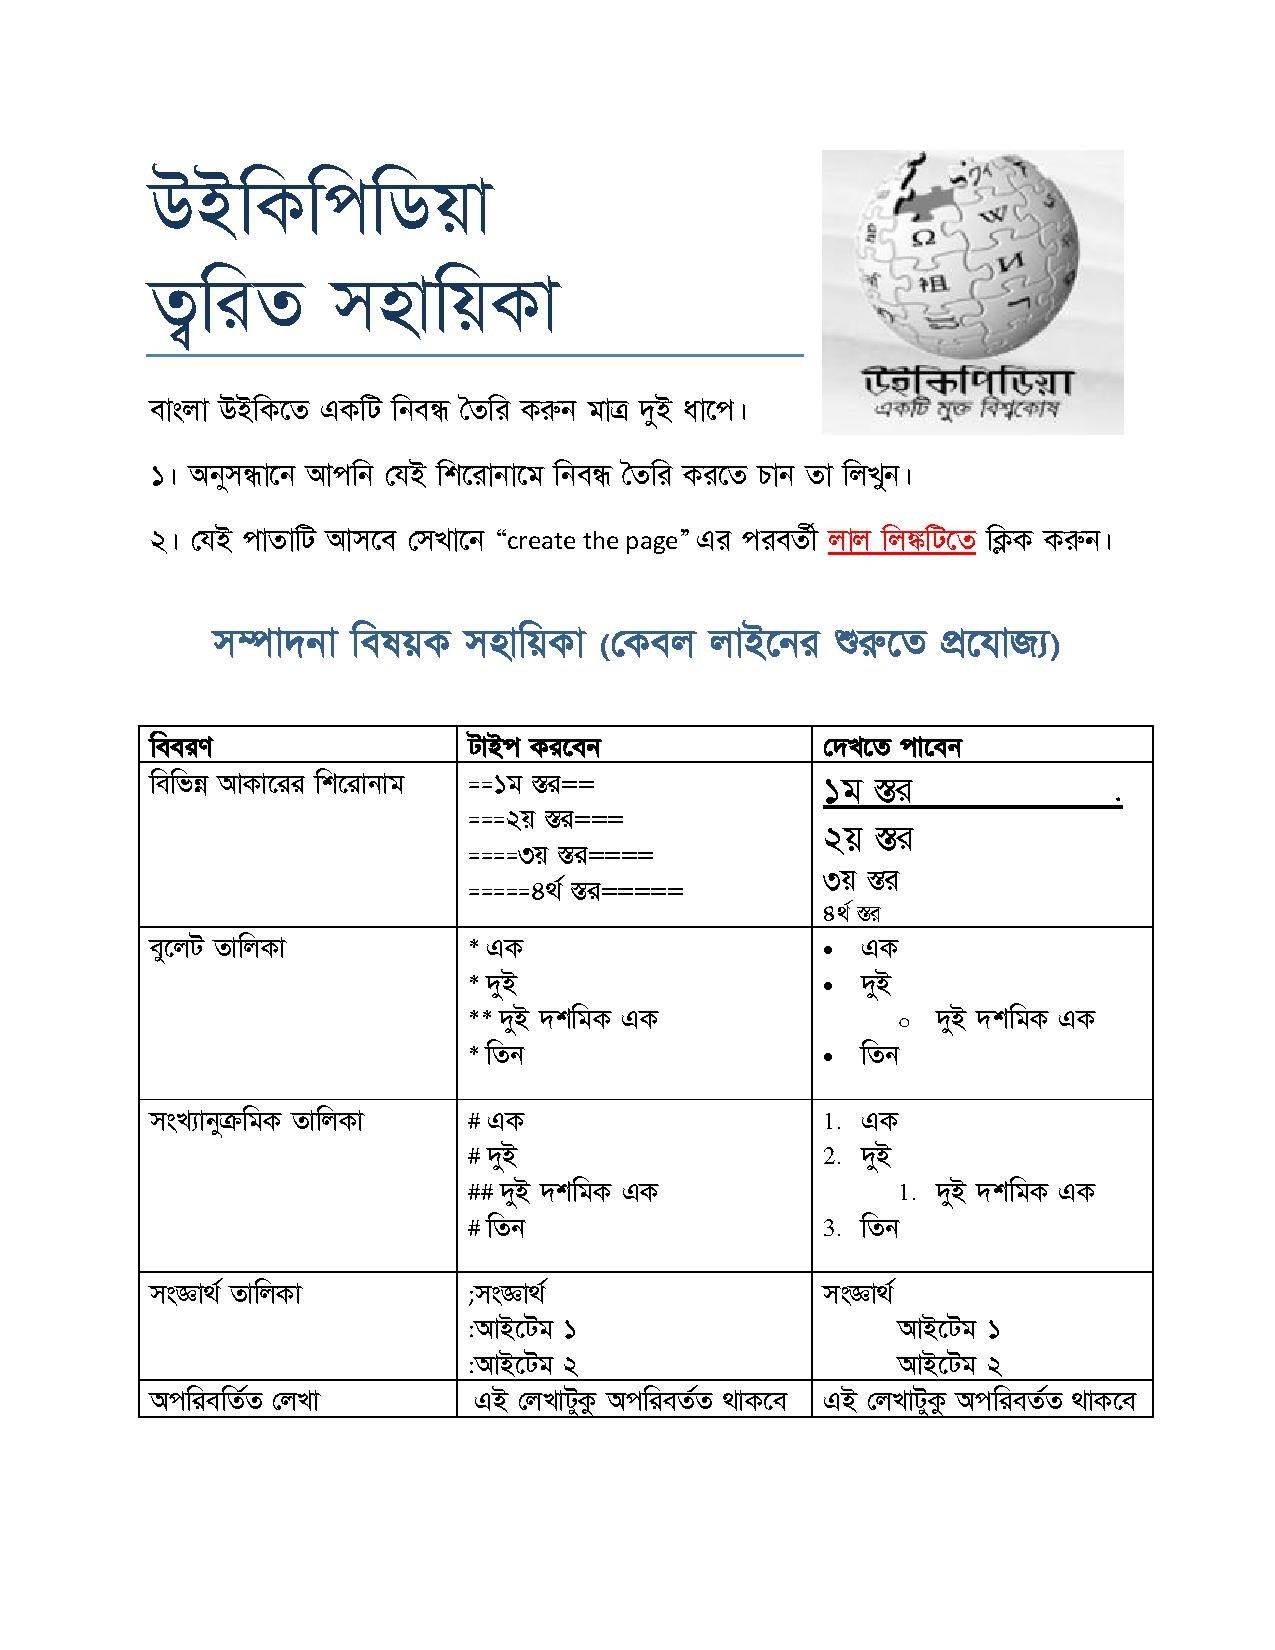 Filebengali cheatsheet by rushafi and tanvir 20091002pdf meta filebengali cheatsheet by rushafi and tanvir 20091002pdf ccuart Images